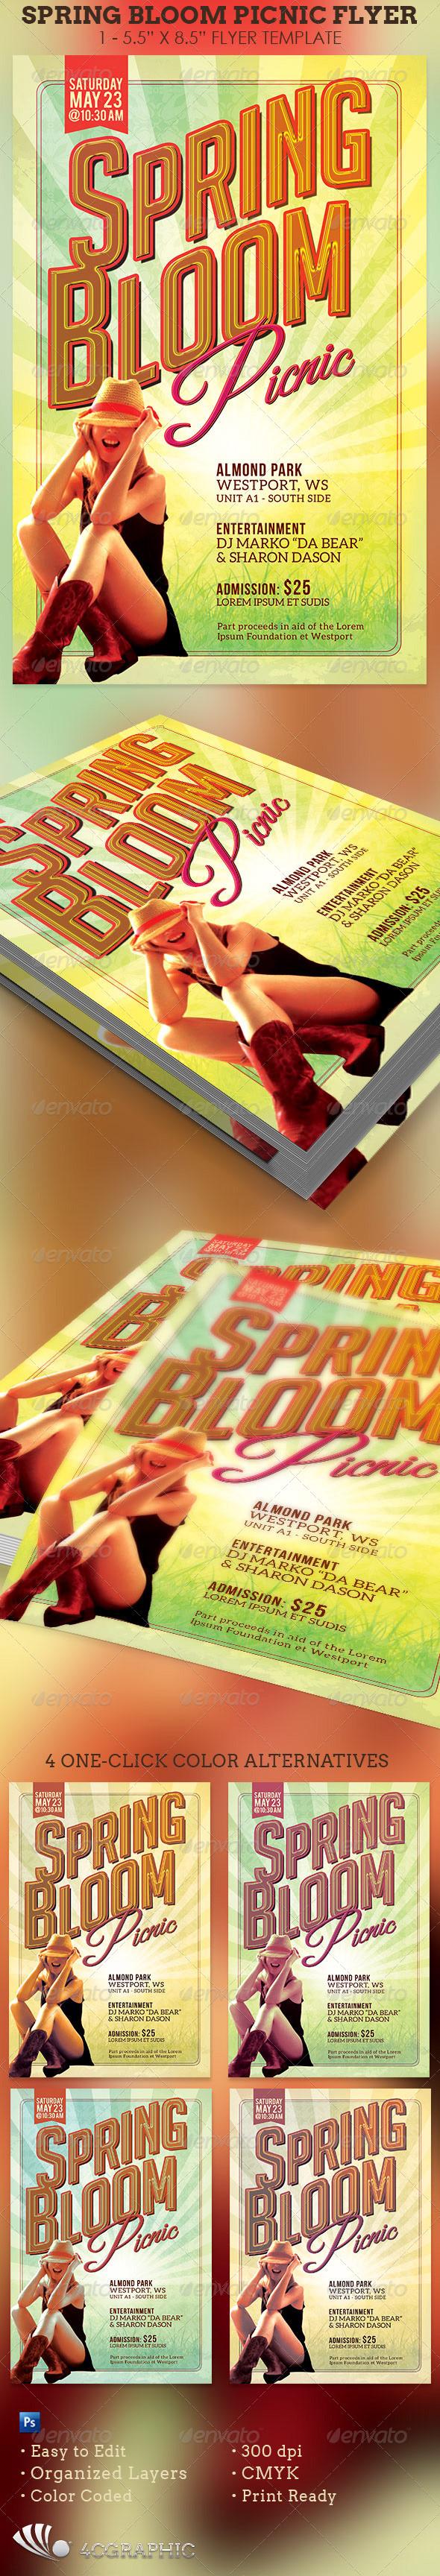 Michael Taylor Godserv Print Template Portfolio Spring Bloom